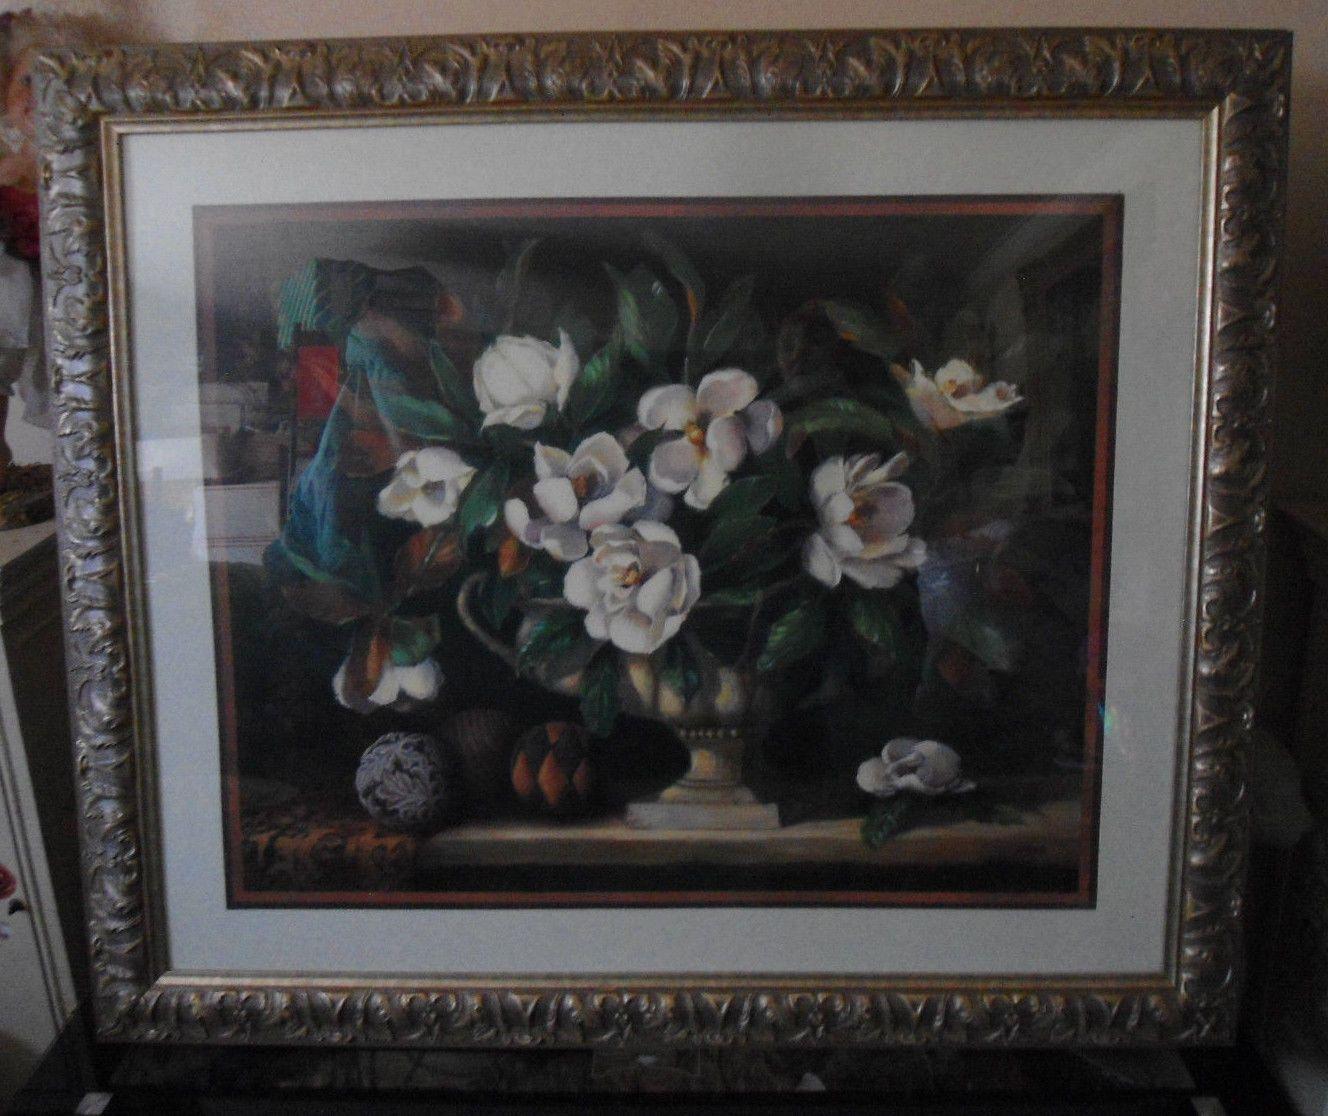 Magnolia Homes Interiors: Large Home Interiors Silver Framed Floral Magnolia Print